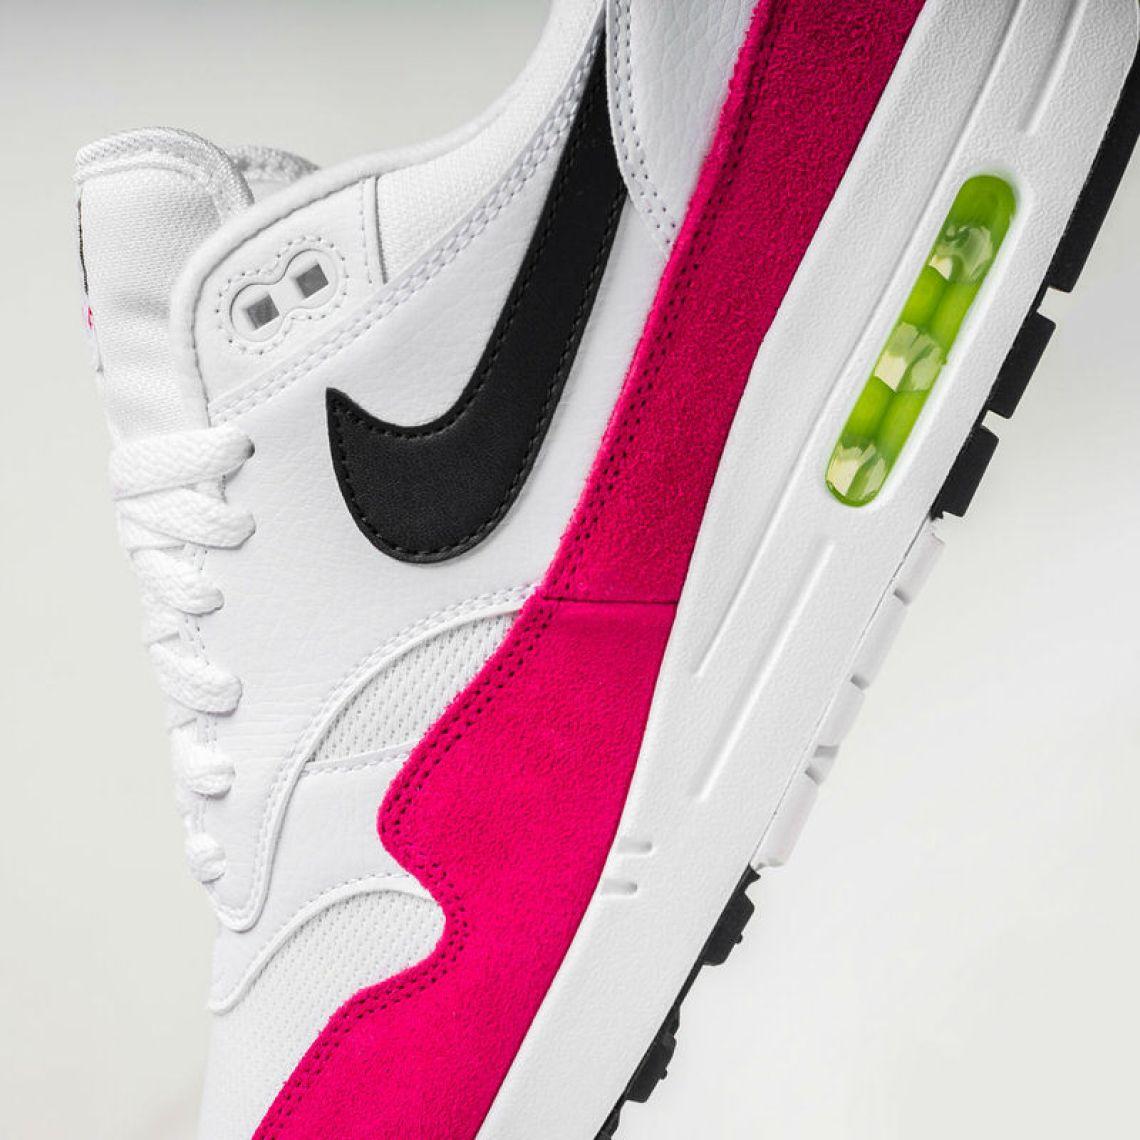 promo code faa99 9c625 Nike Air Max 1 Rush Pink Volt